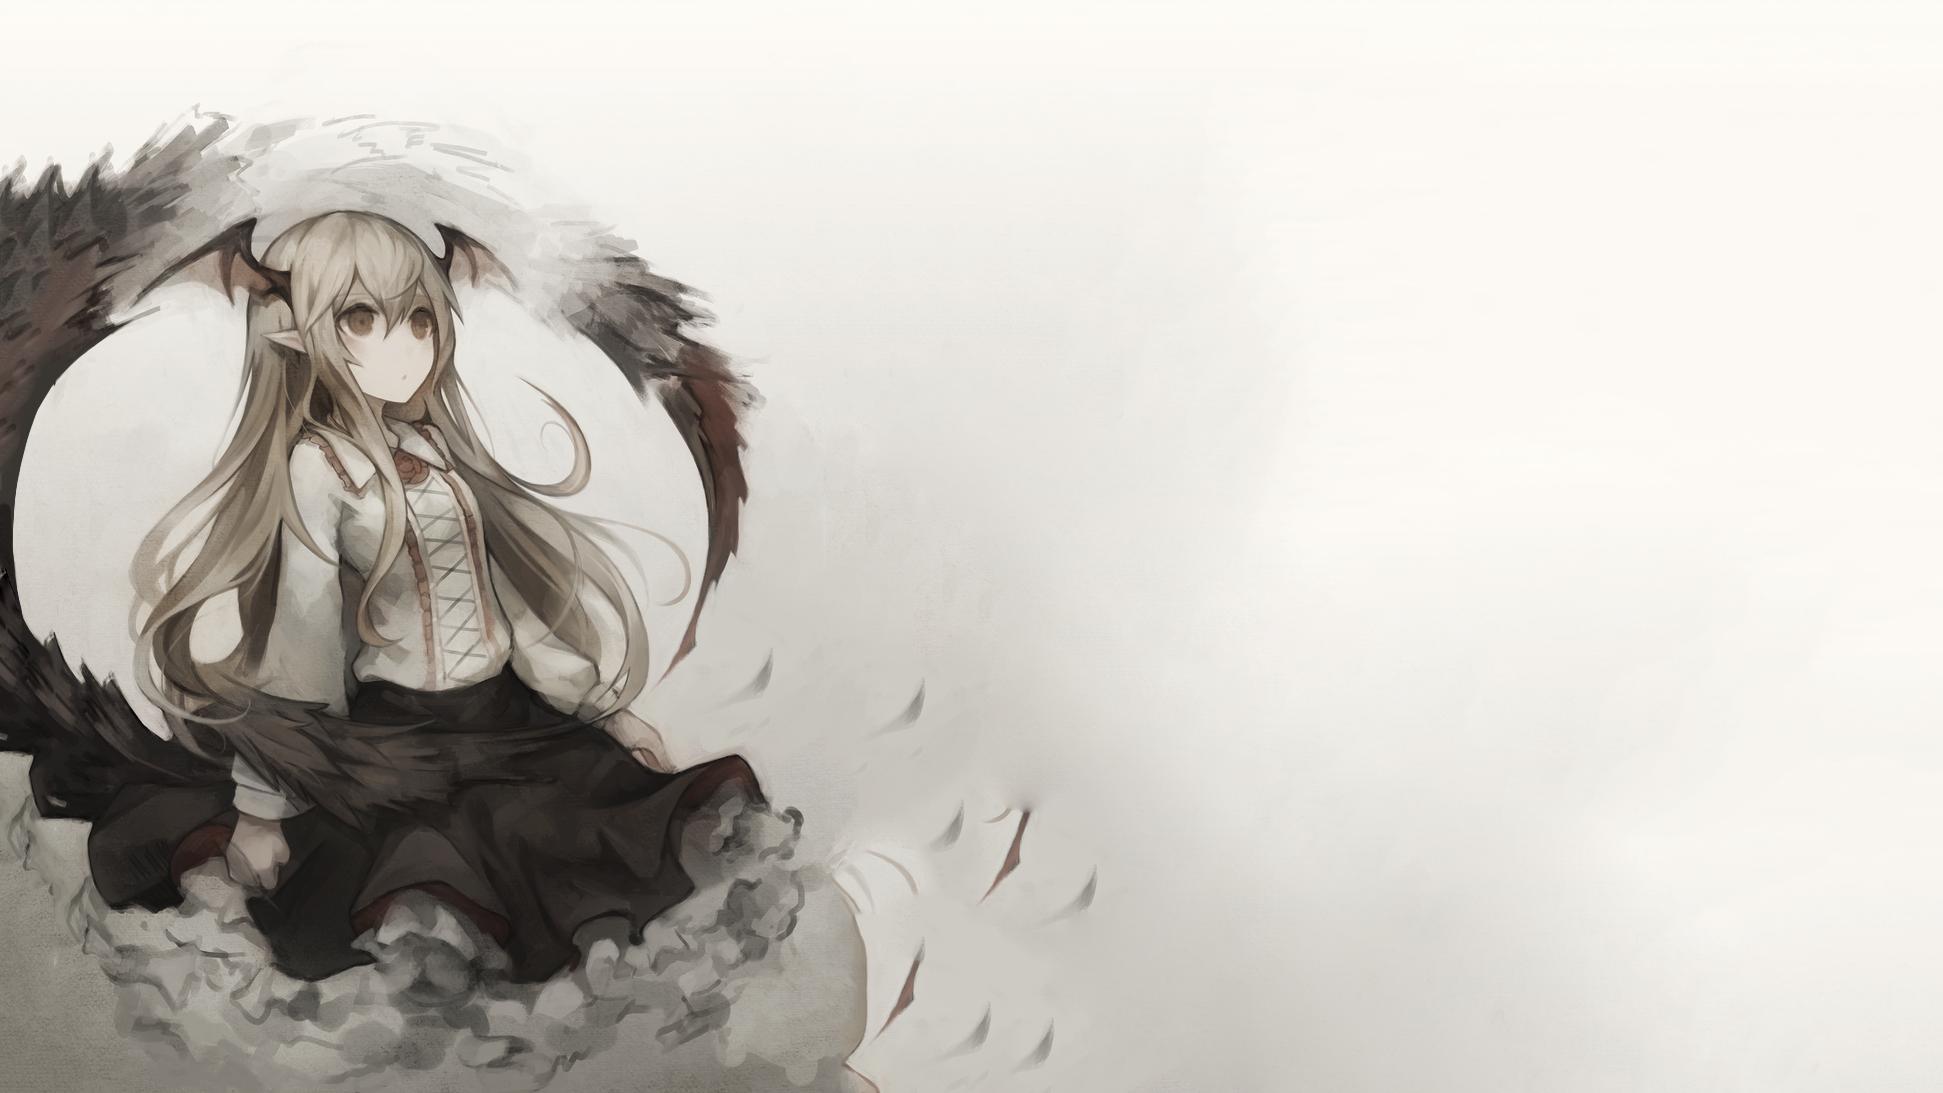 Gambar ilustrasi anime gadis anime solo sketsa